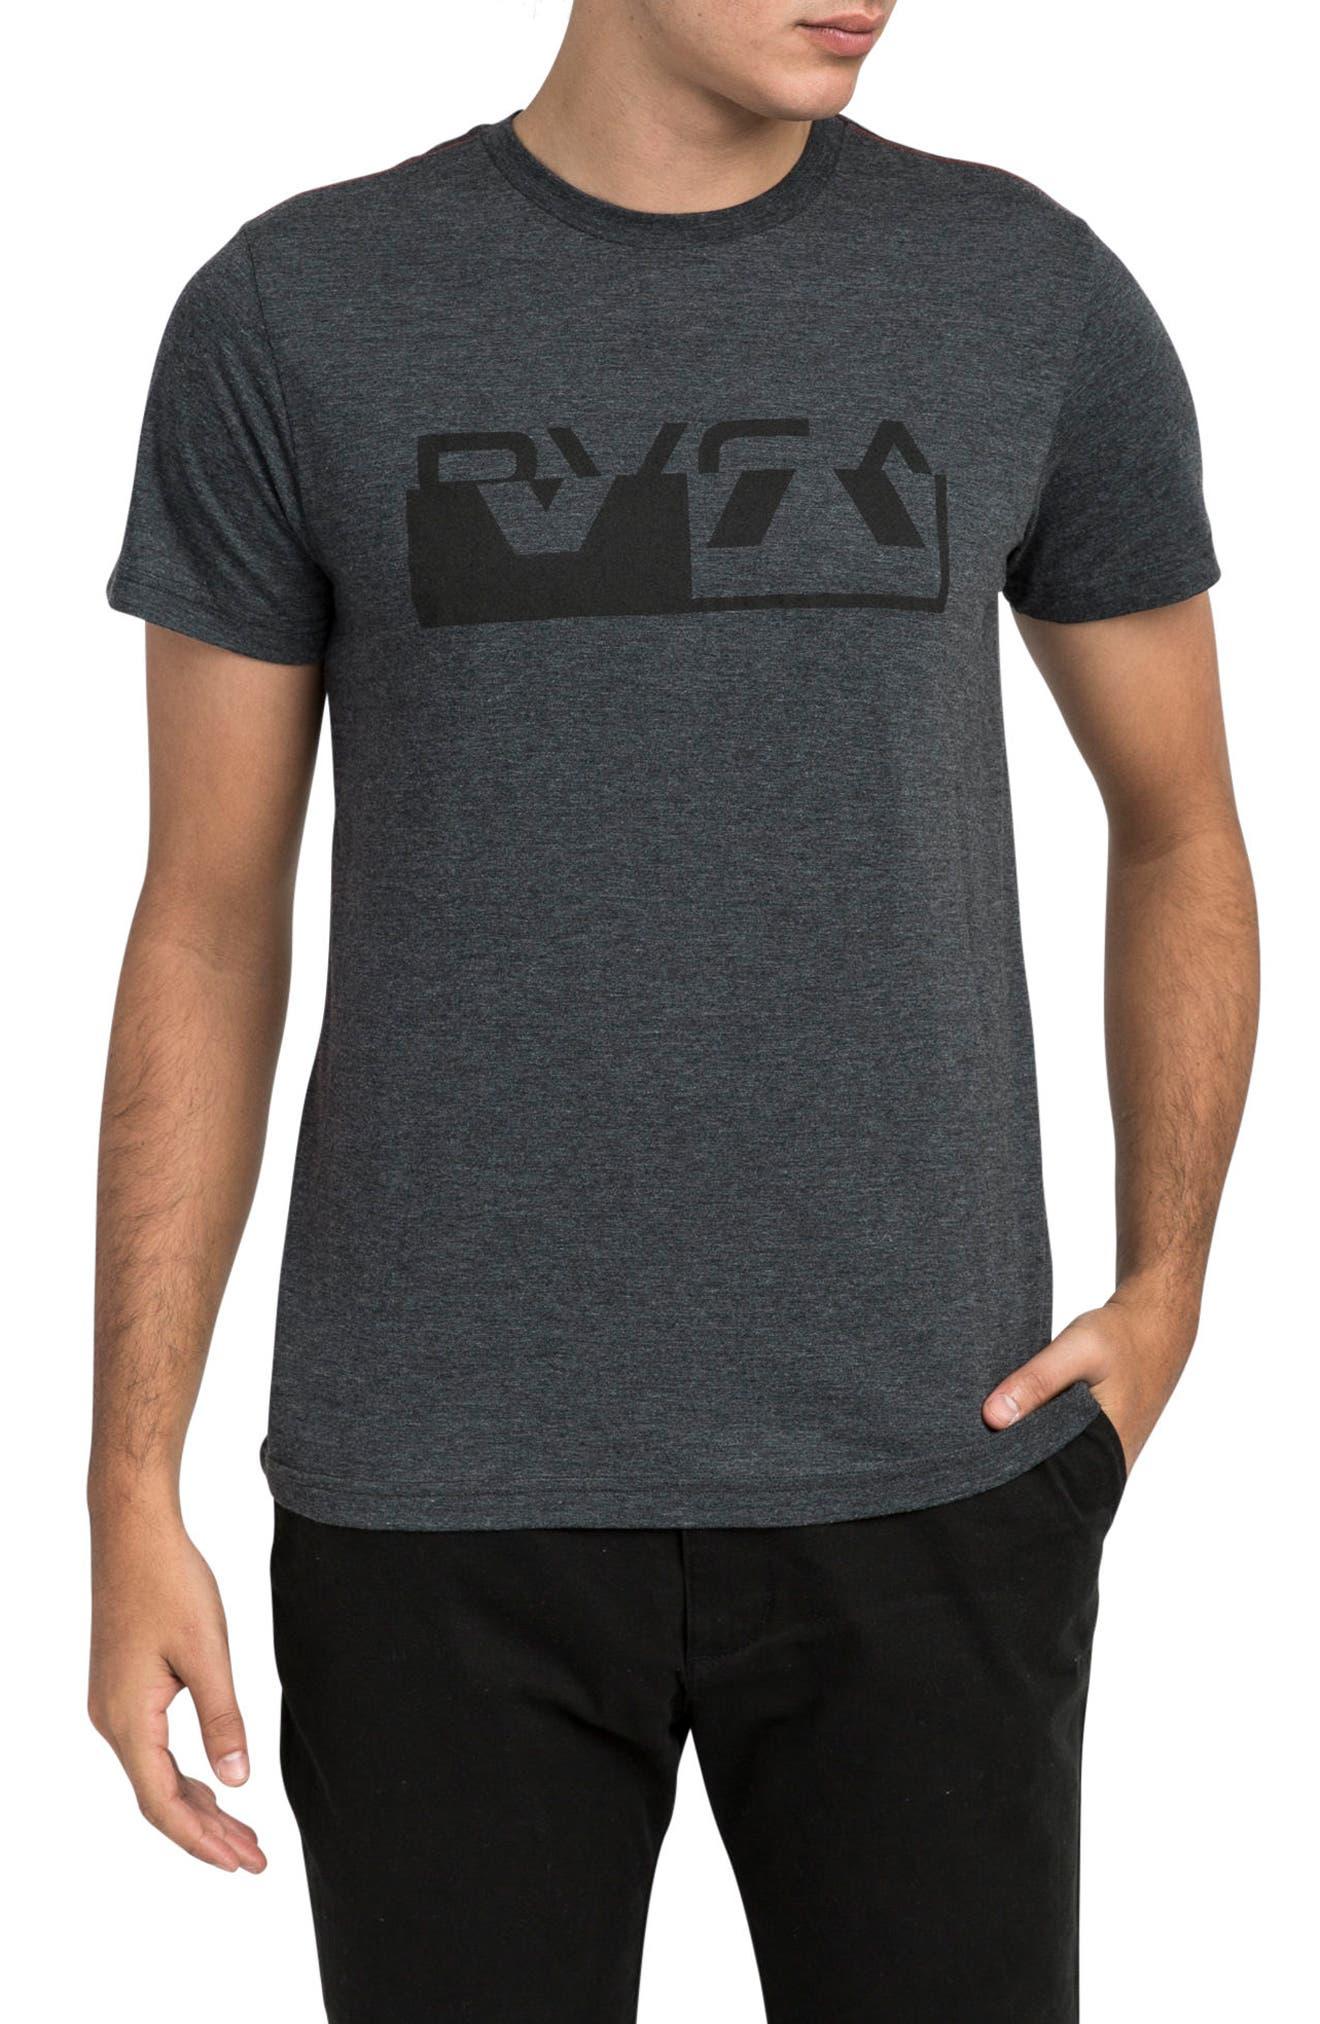 Co Brand Logo Graphic T-Shirt,                         Main,                         color, Rvca Black